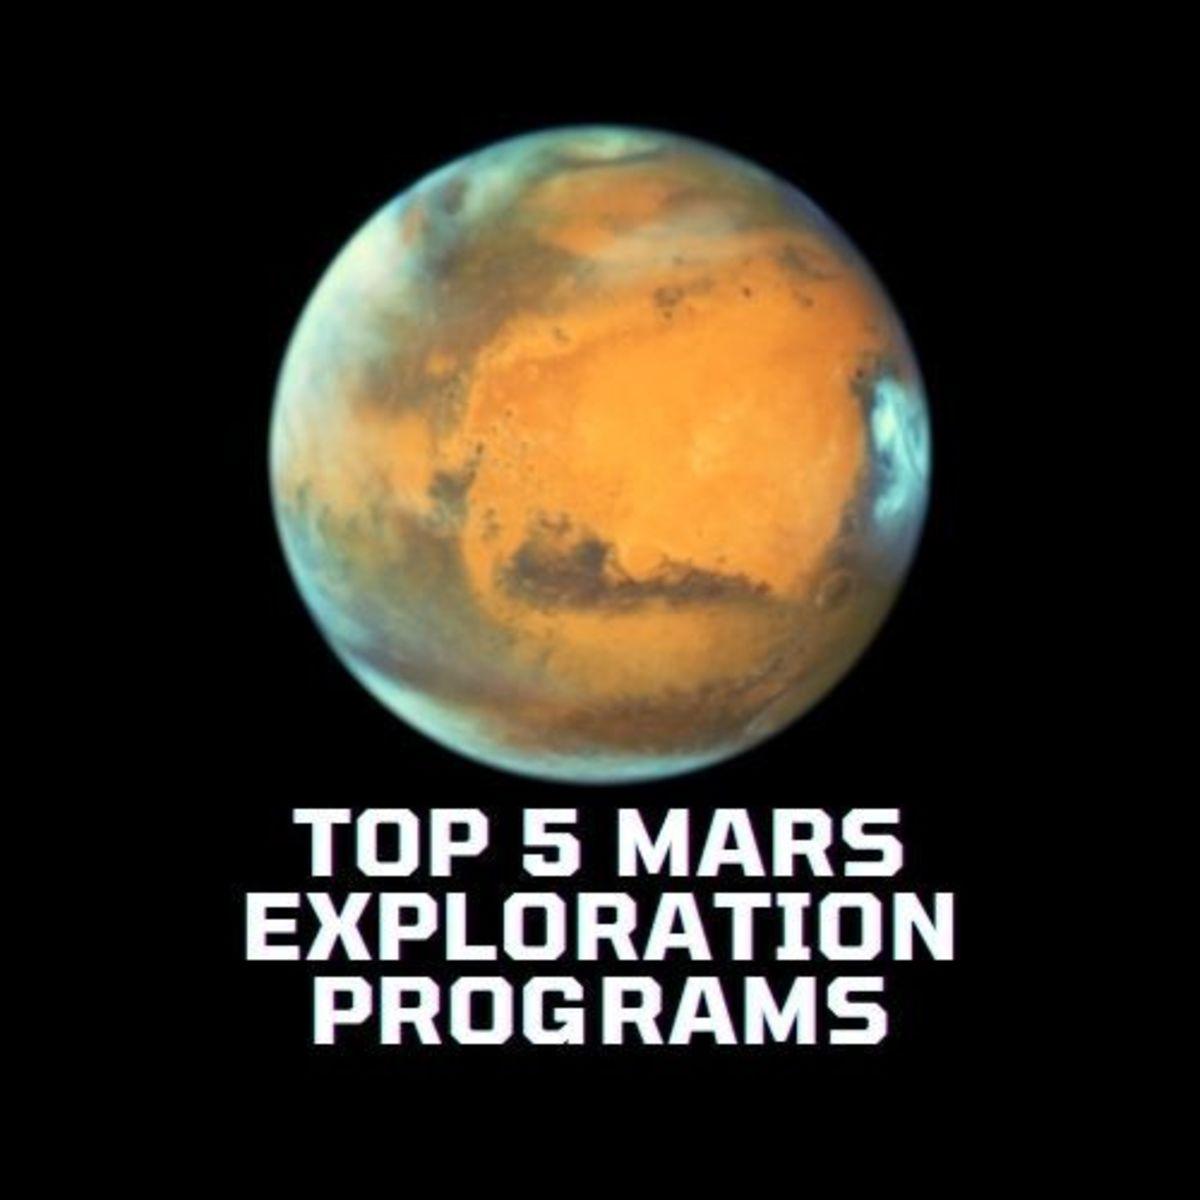 Top 5 Mars Exploration Programs